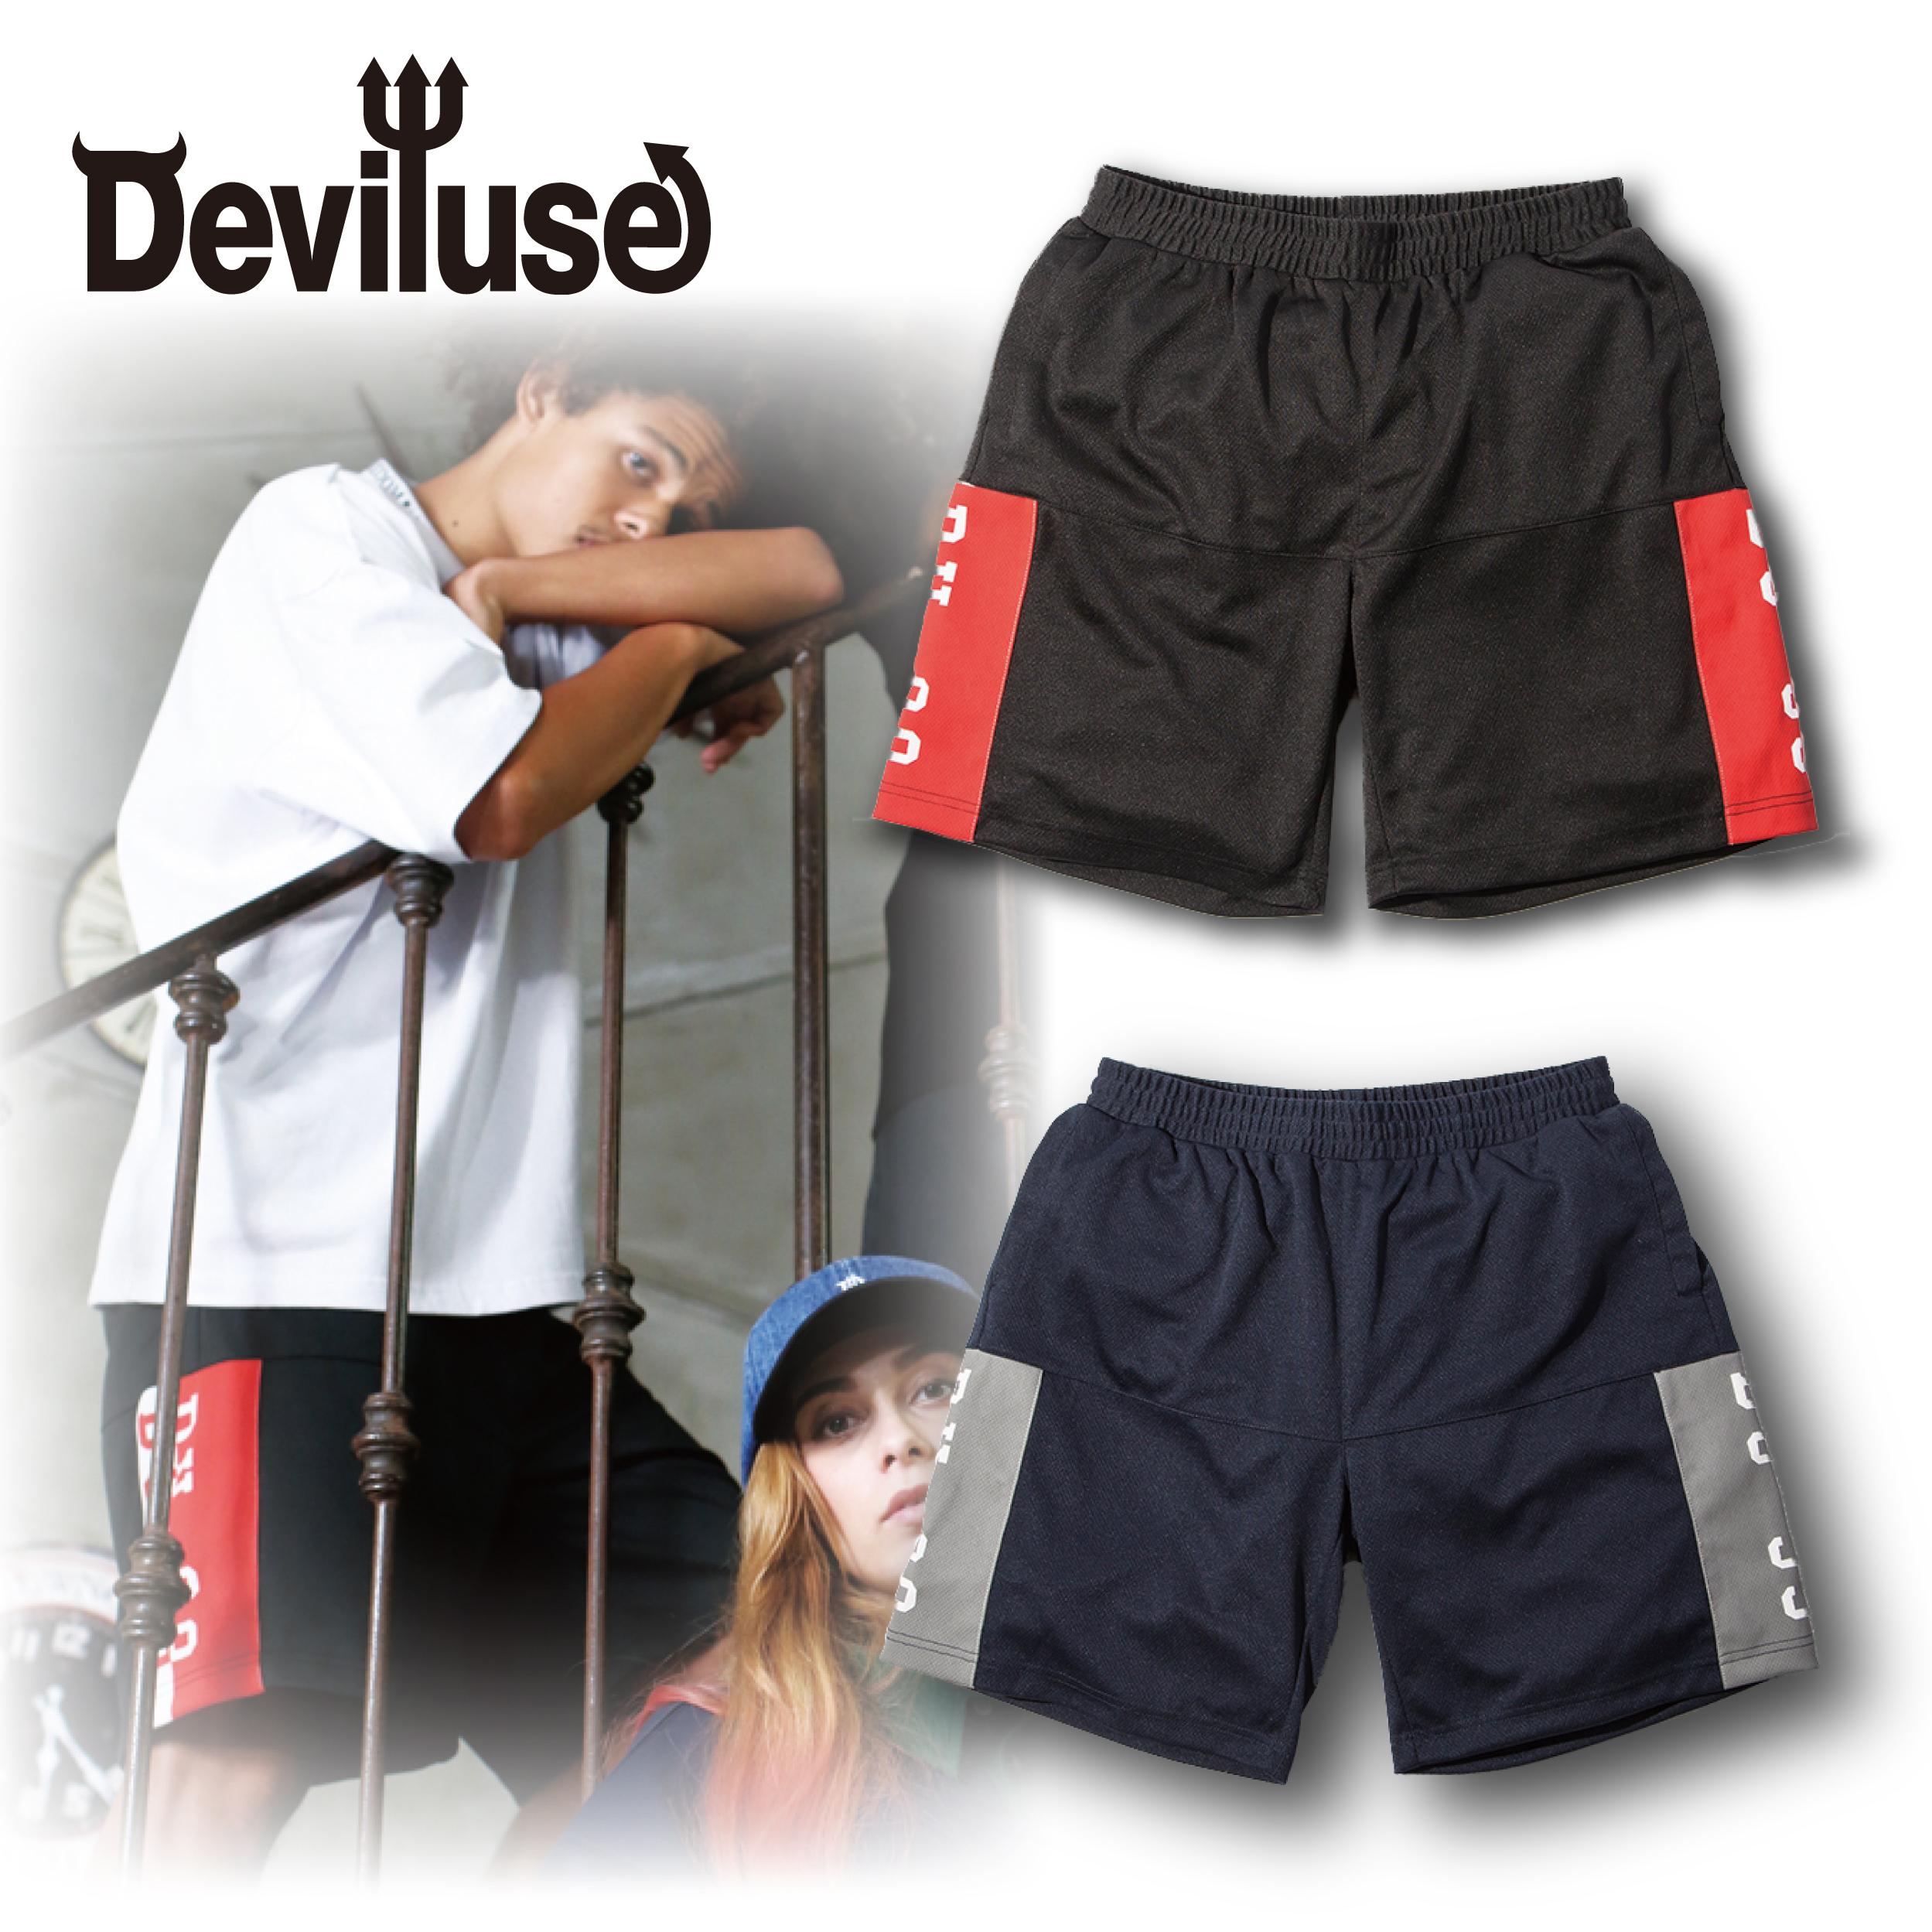 Deviluse(デビルユース) | DU-99 Mesh Shorts